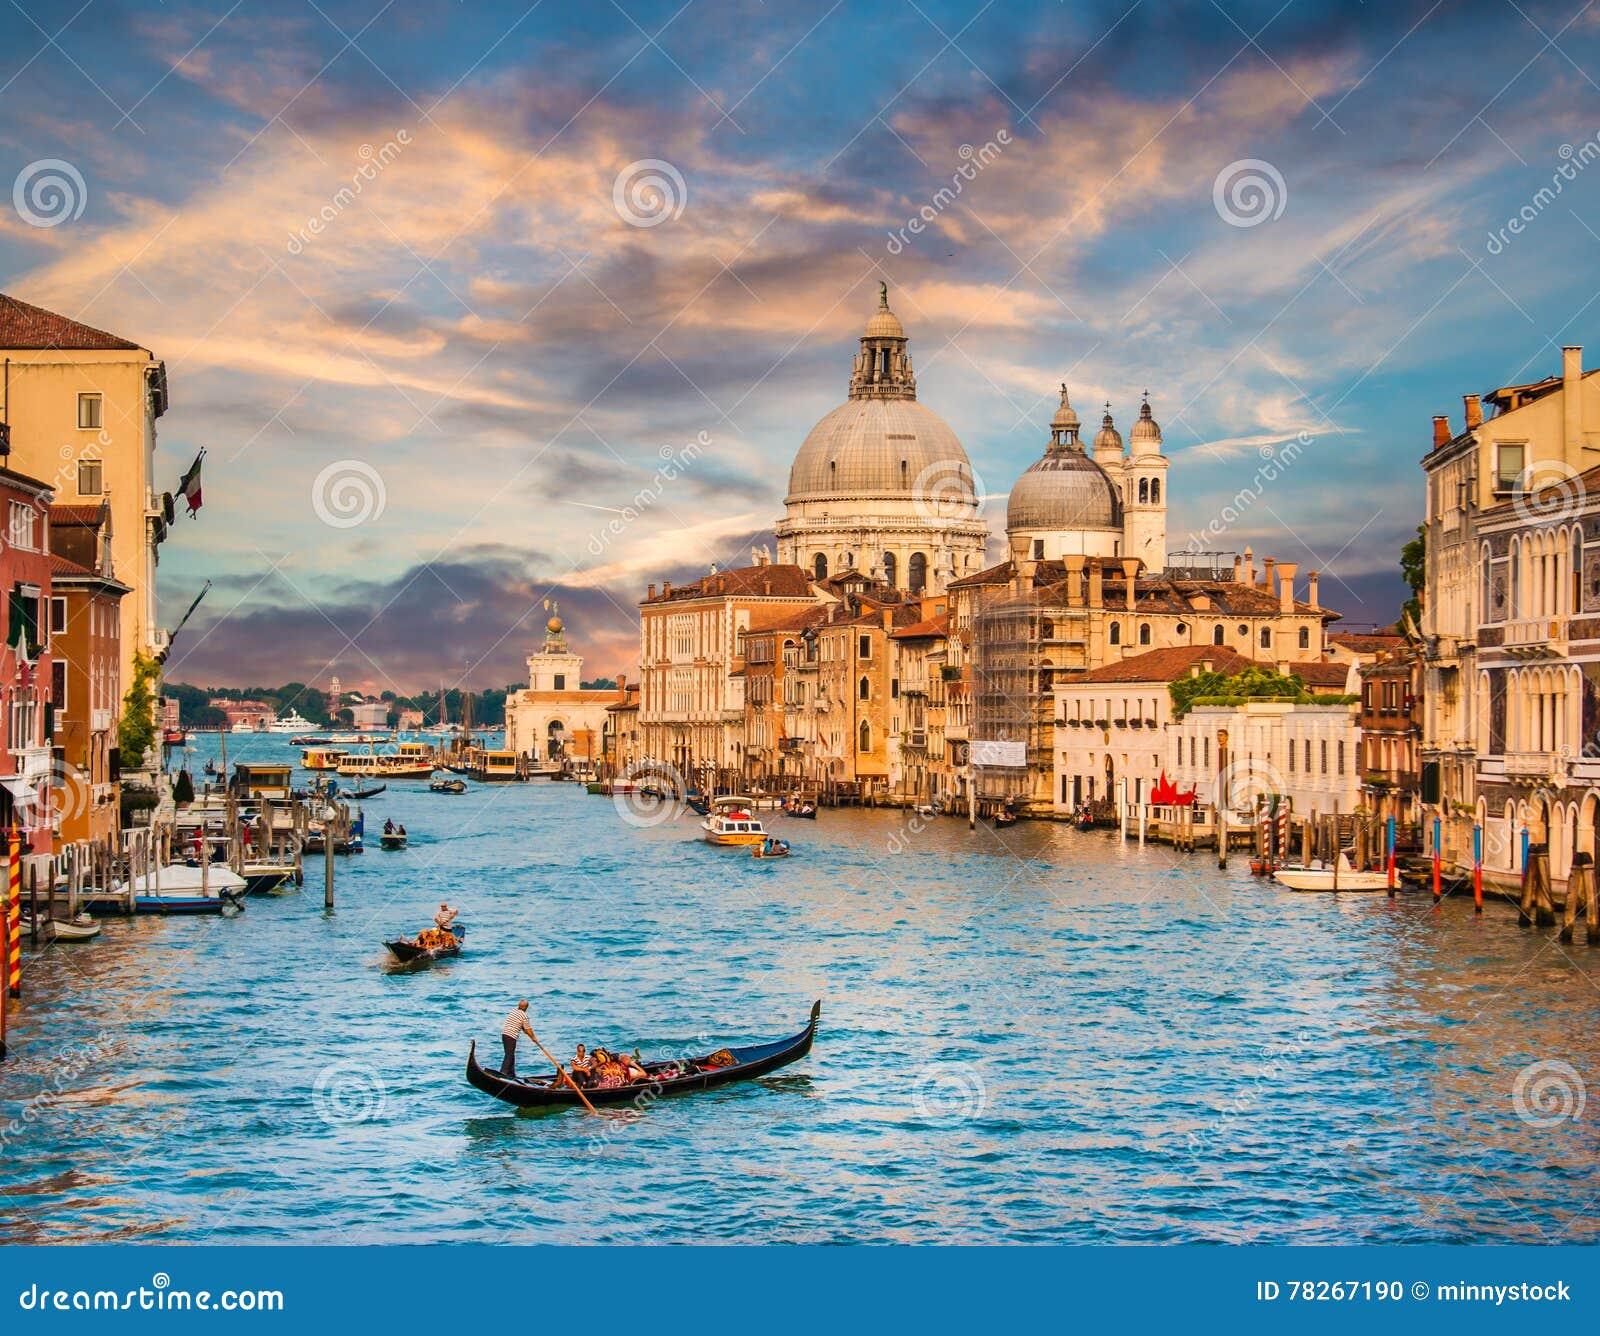 Canal Grande with Santa Maria Della Salute at sunset, Venice, Italy